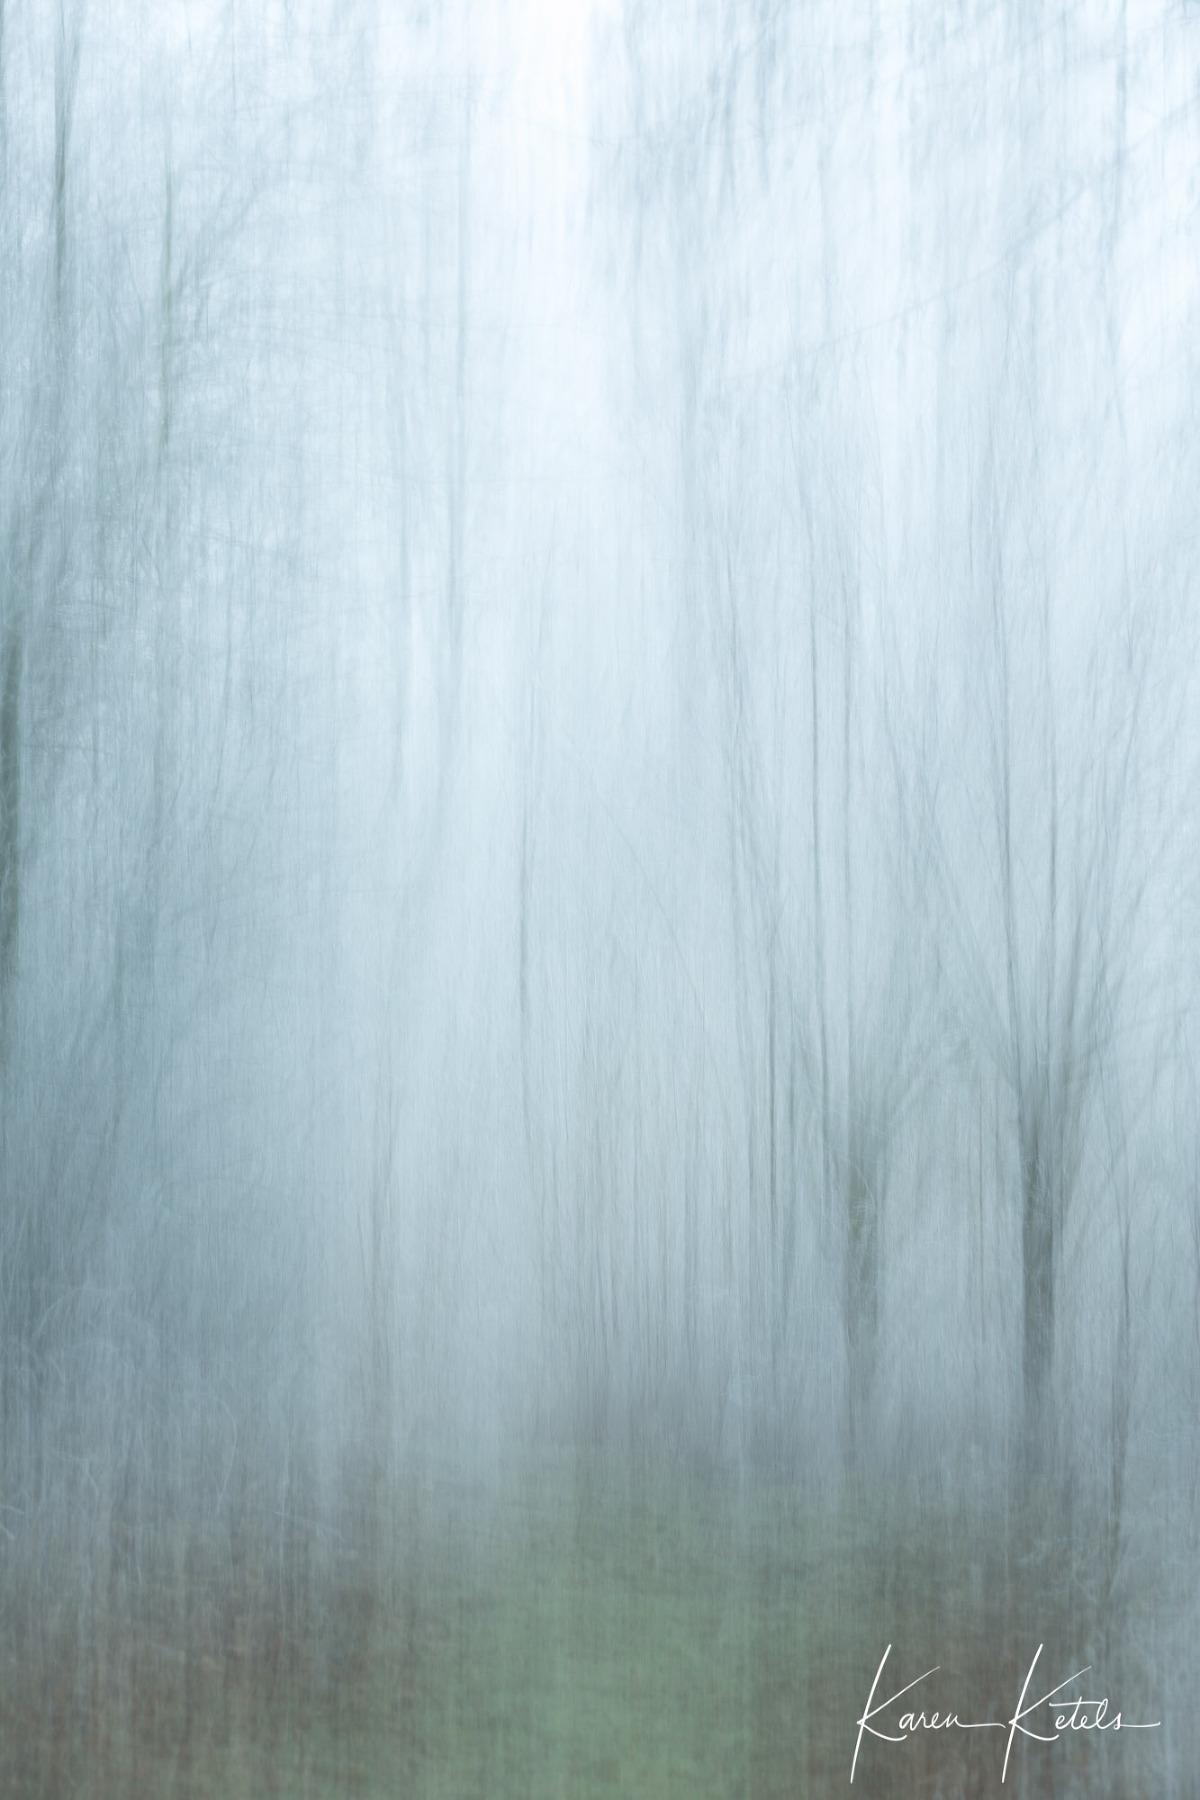 Fine art willows in winter by Karen Ketels